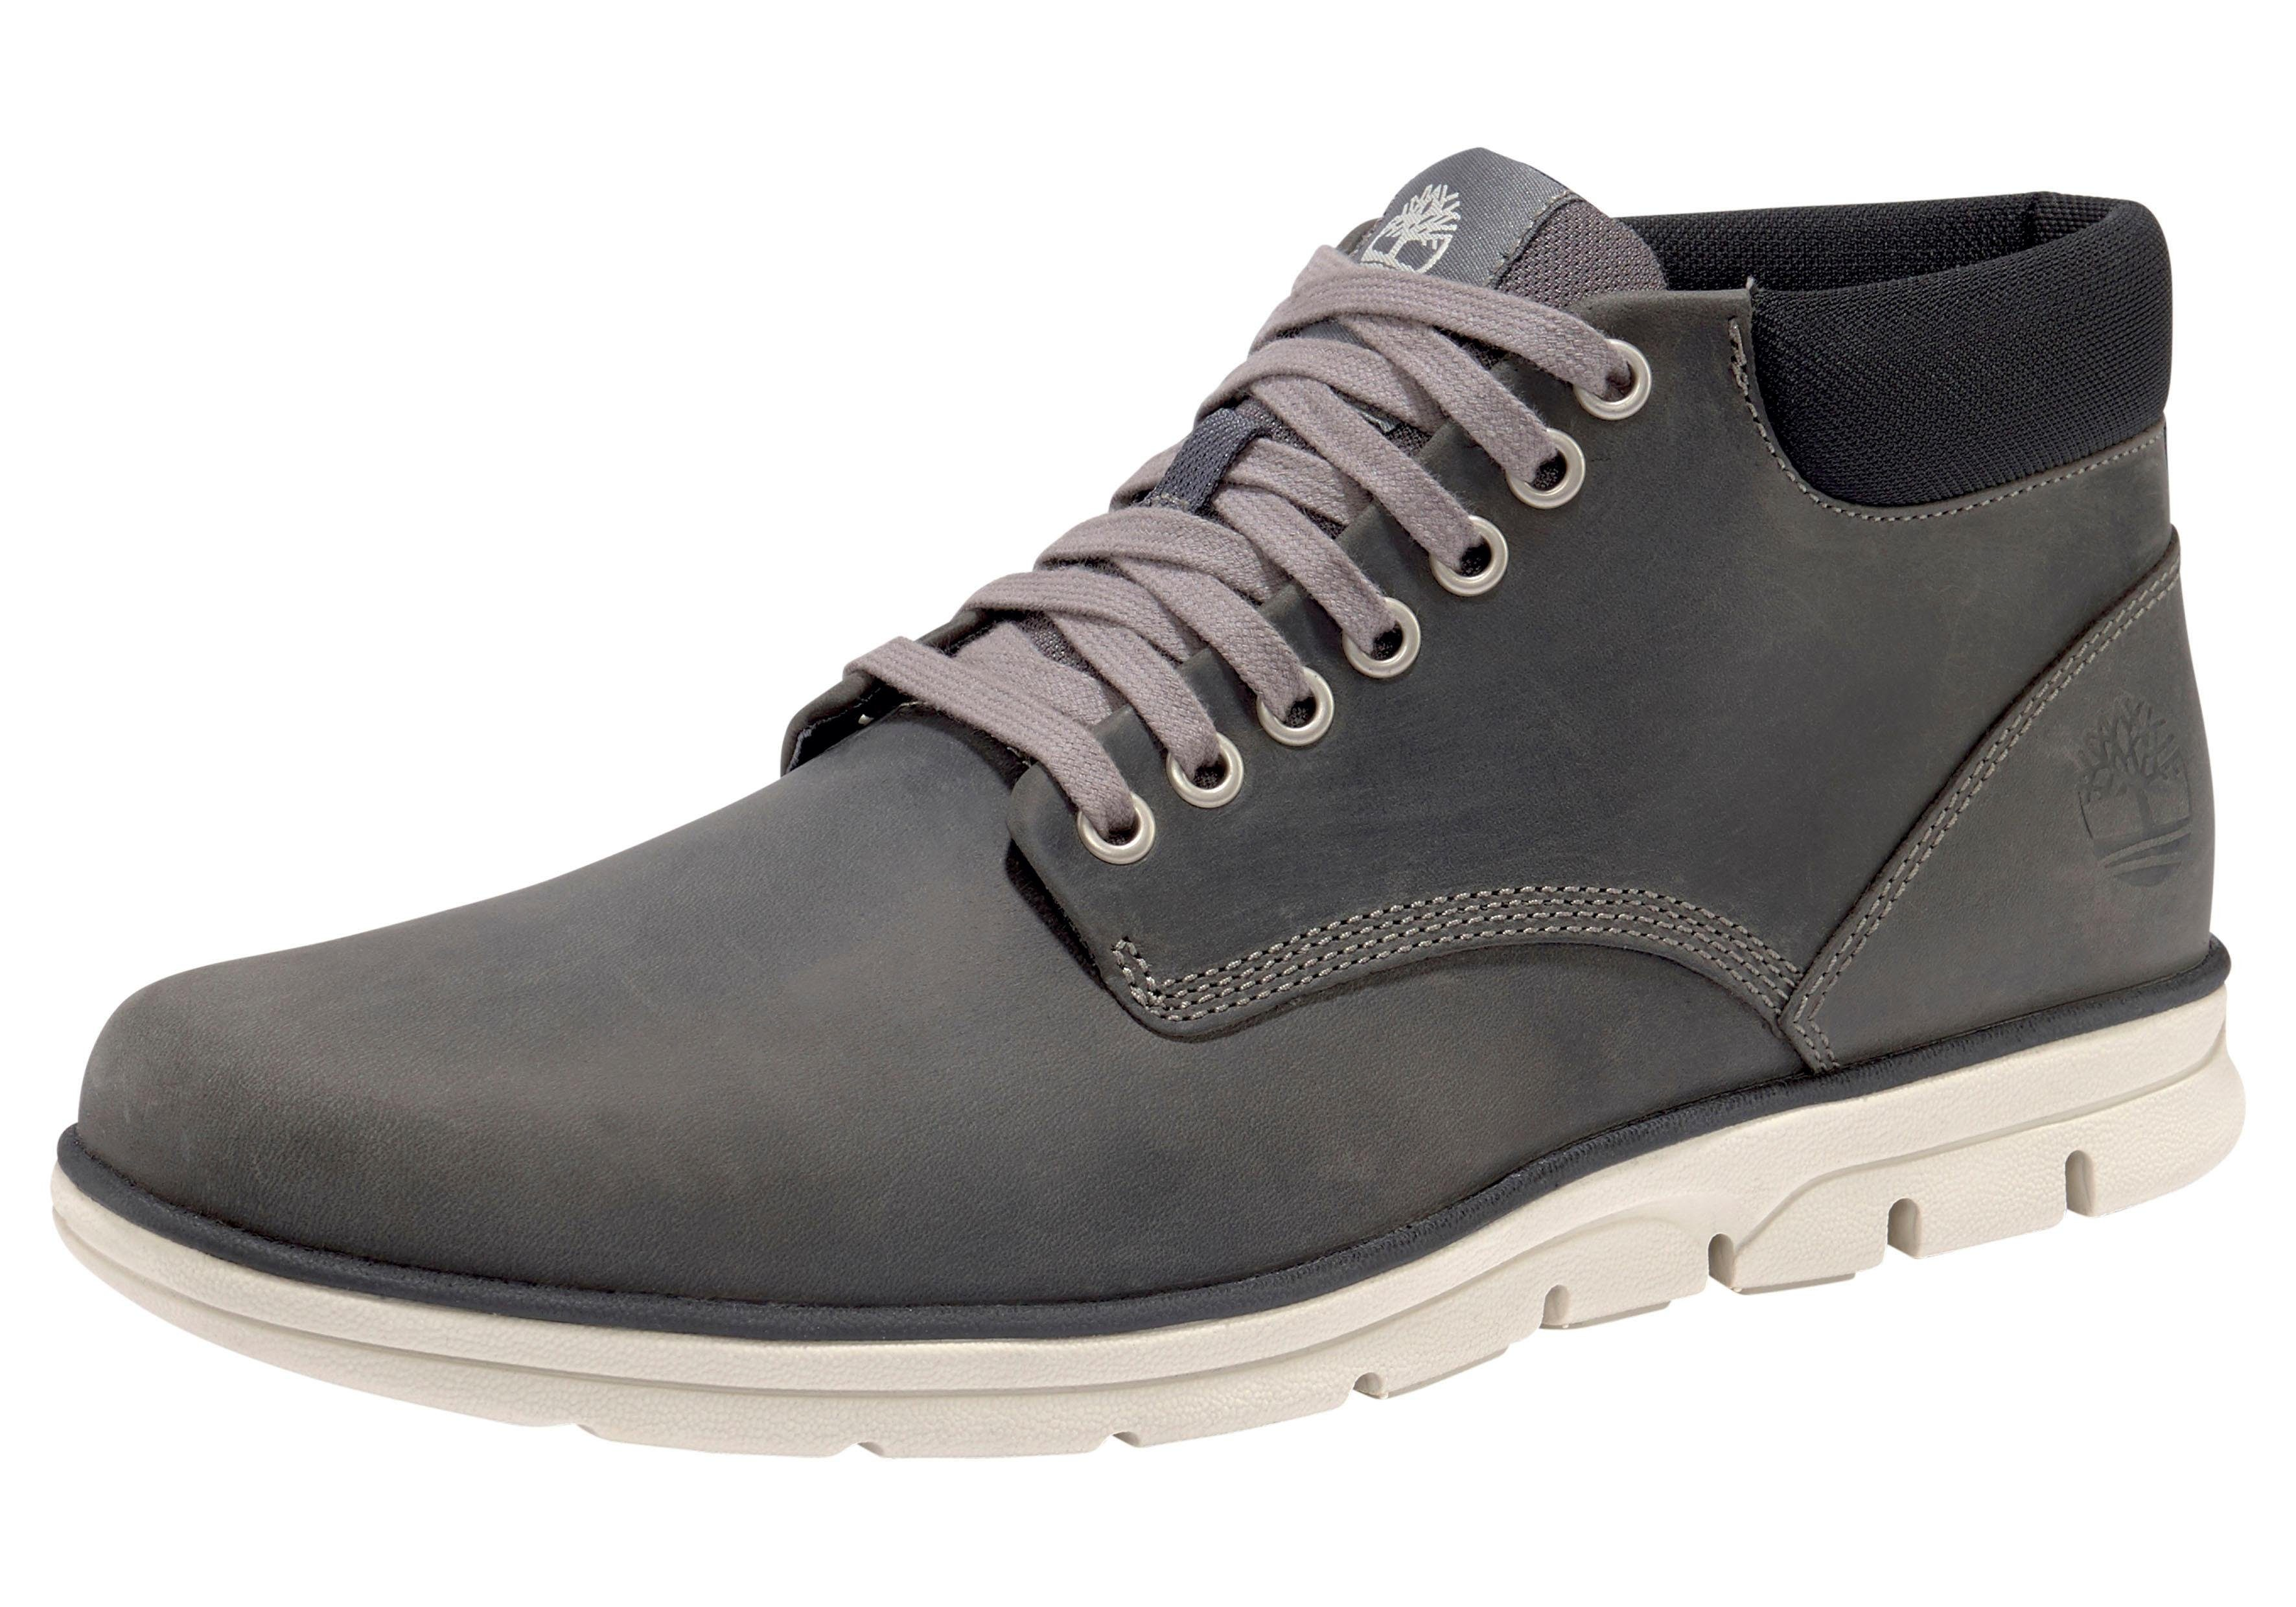 Timberland Herren Bradstreet Leather Sensorflex Chukka Boots, Braun (Pure Cashmere Nubuck), 46 EU